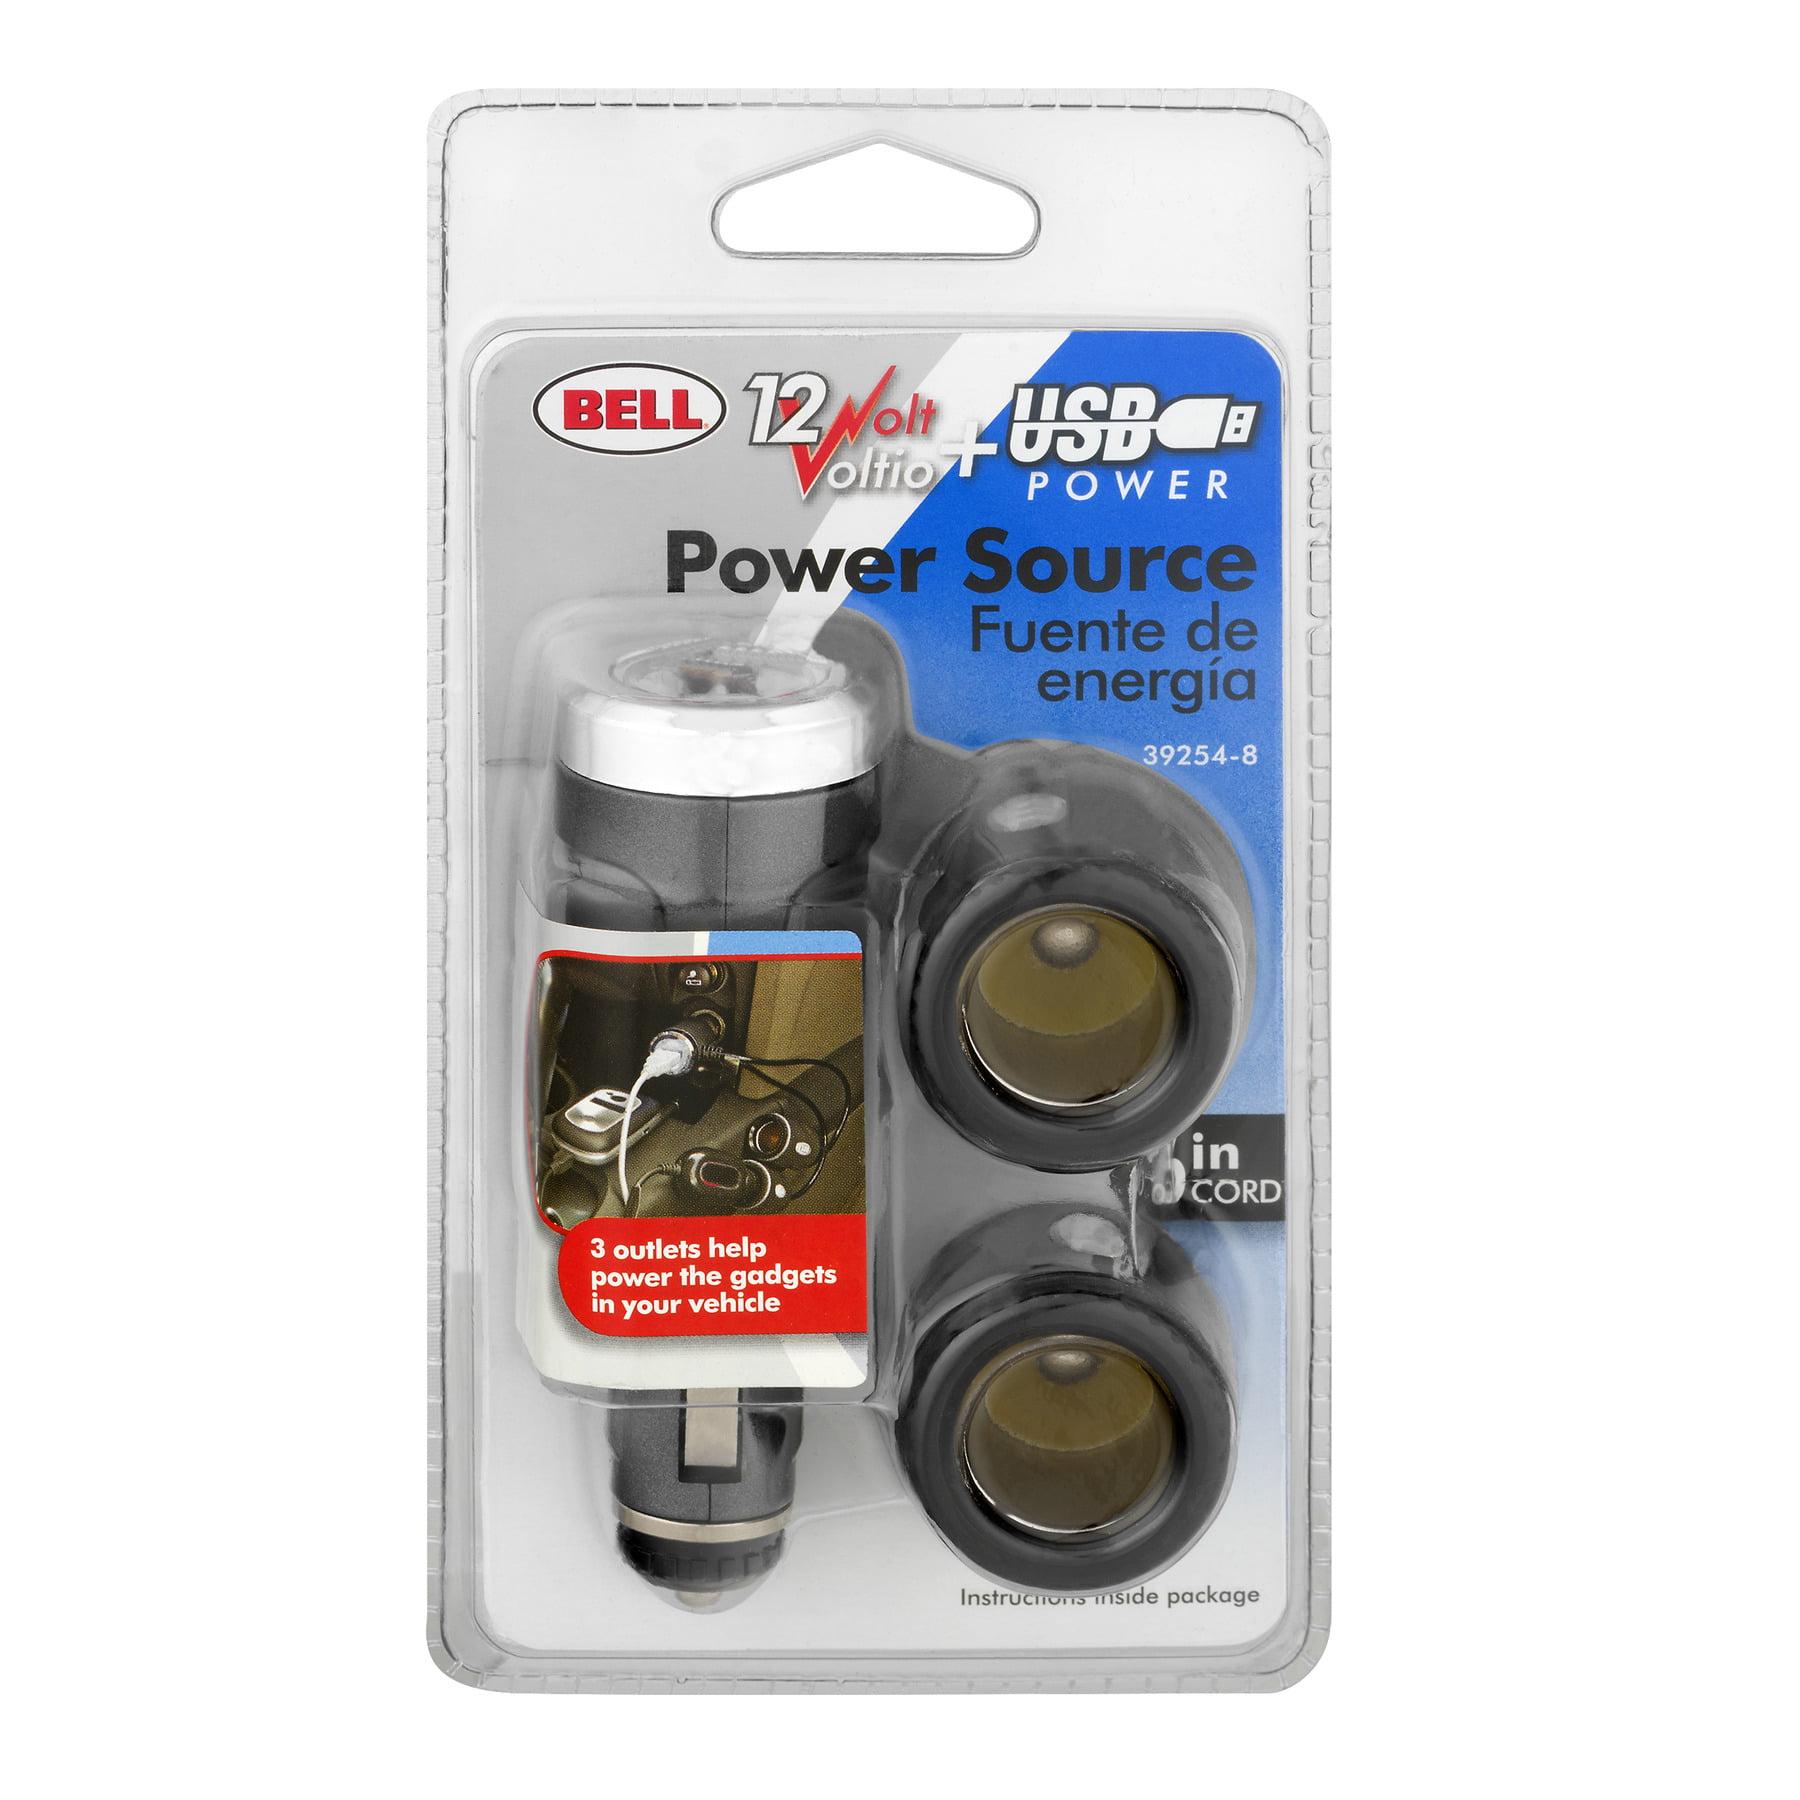 Bell 12 Volt USB Power Source, 1.0 CT